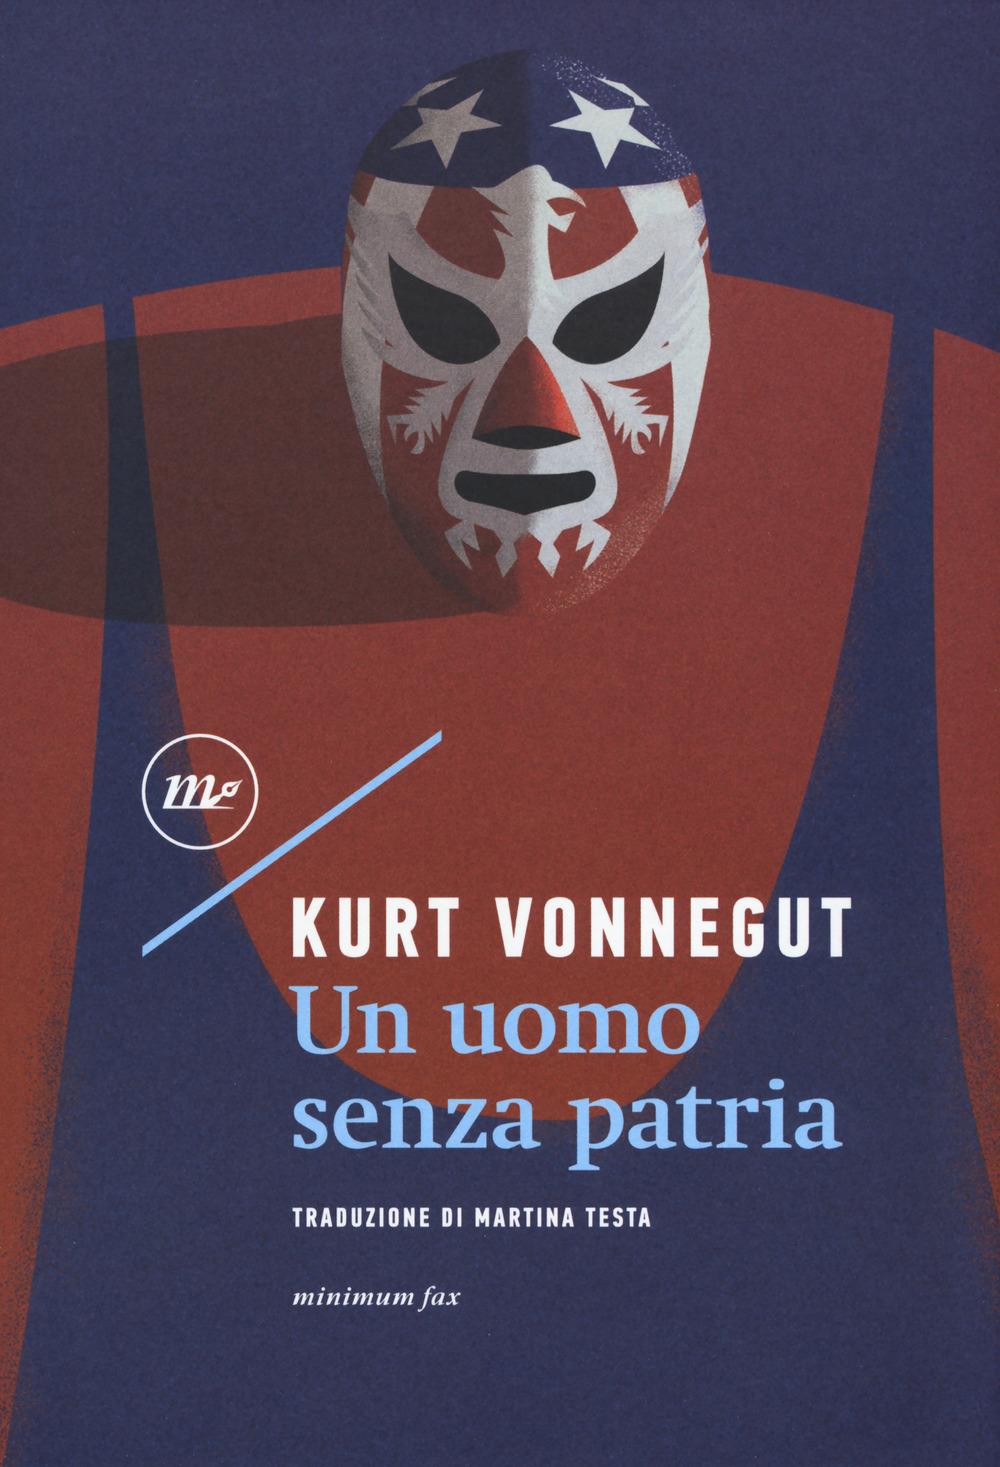 UOMO SENZA PATRIA 3A ED. (UN) - KURT VONNEGUT - 9788875219420